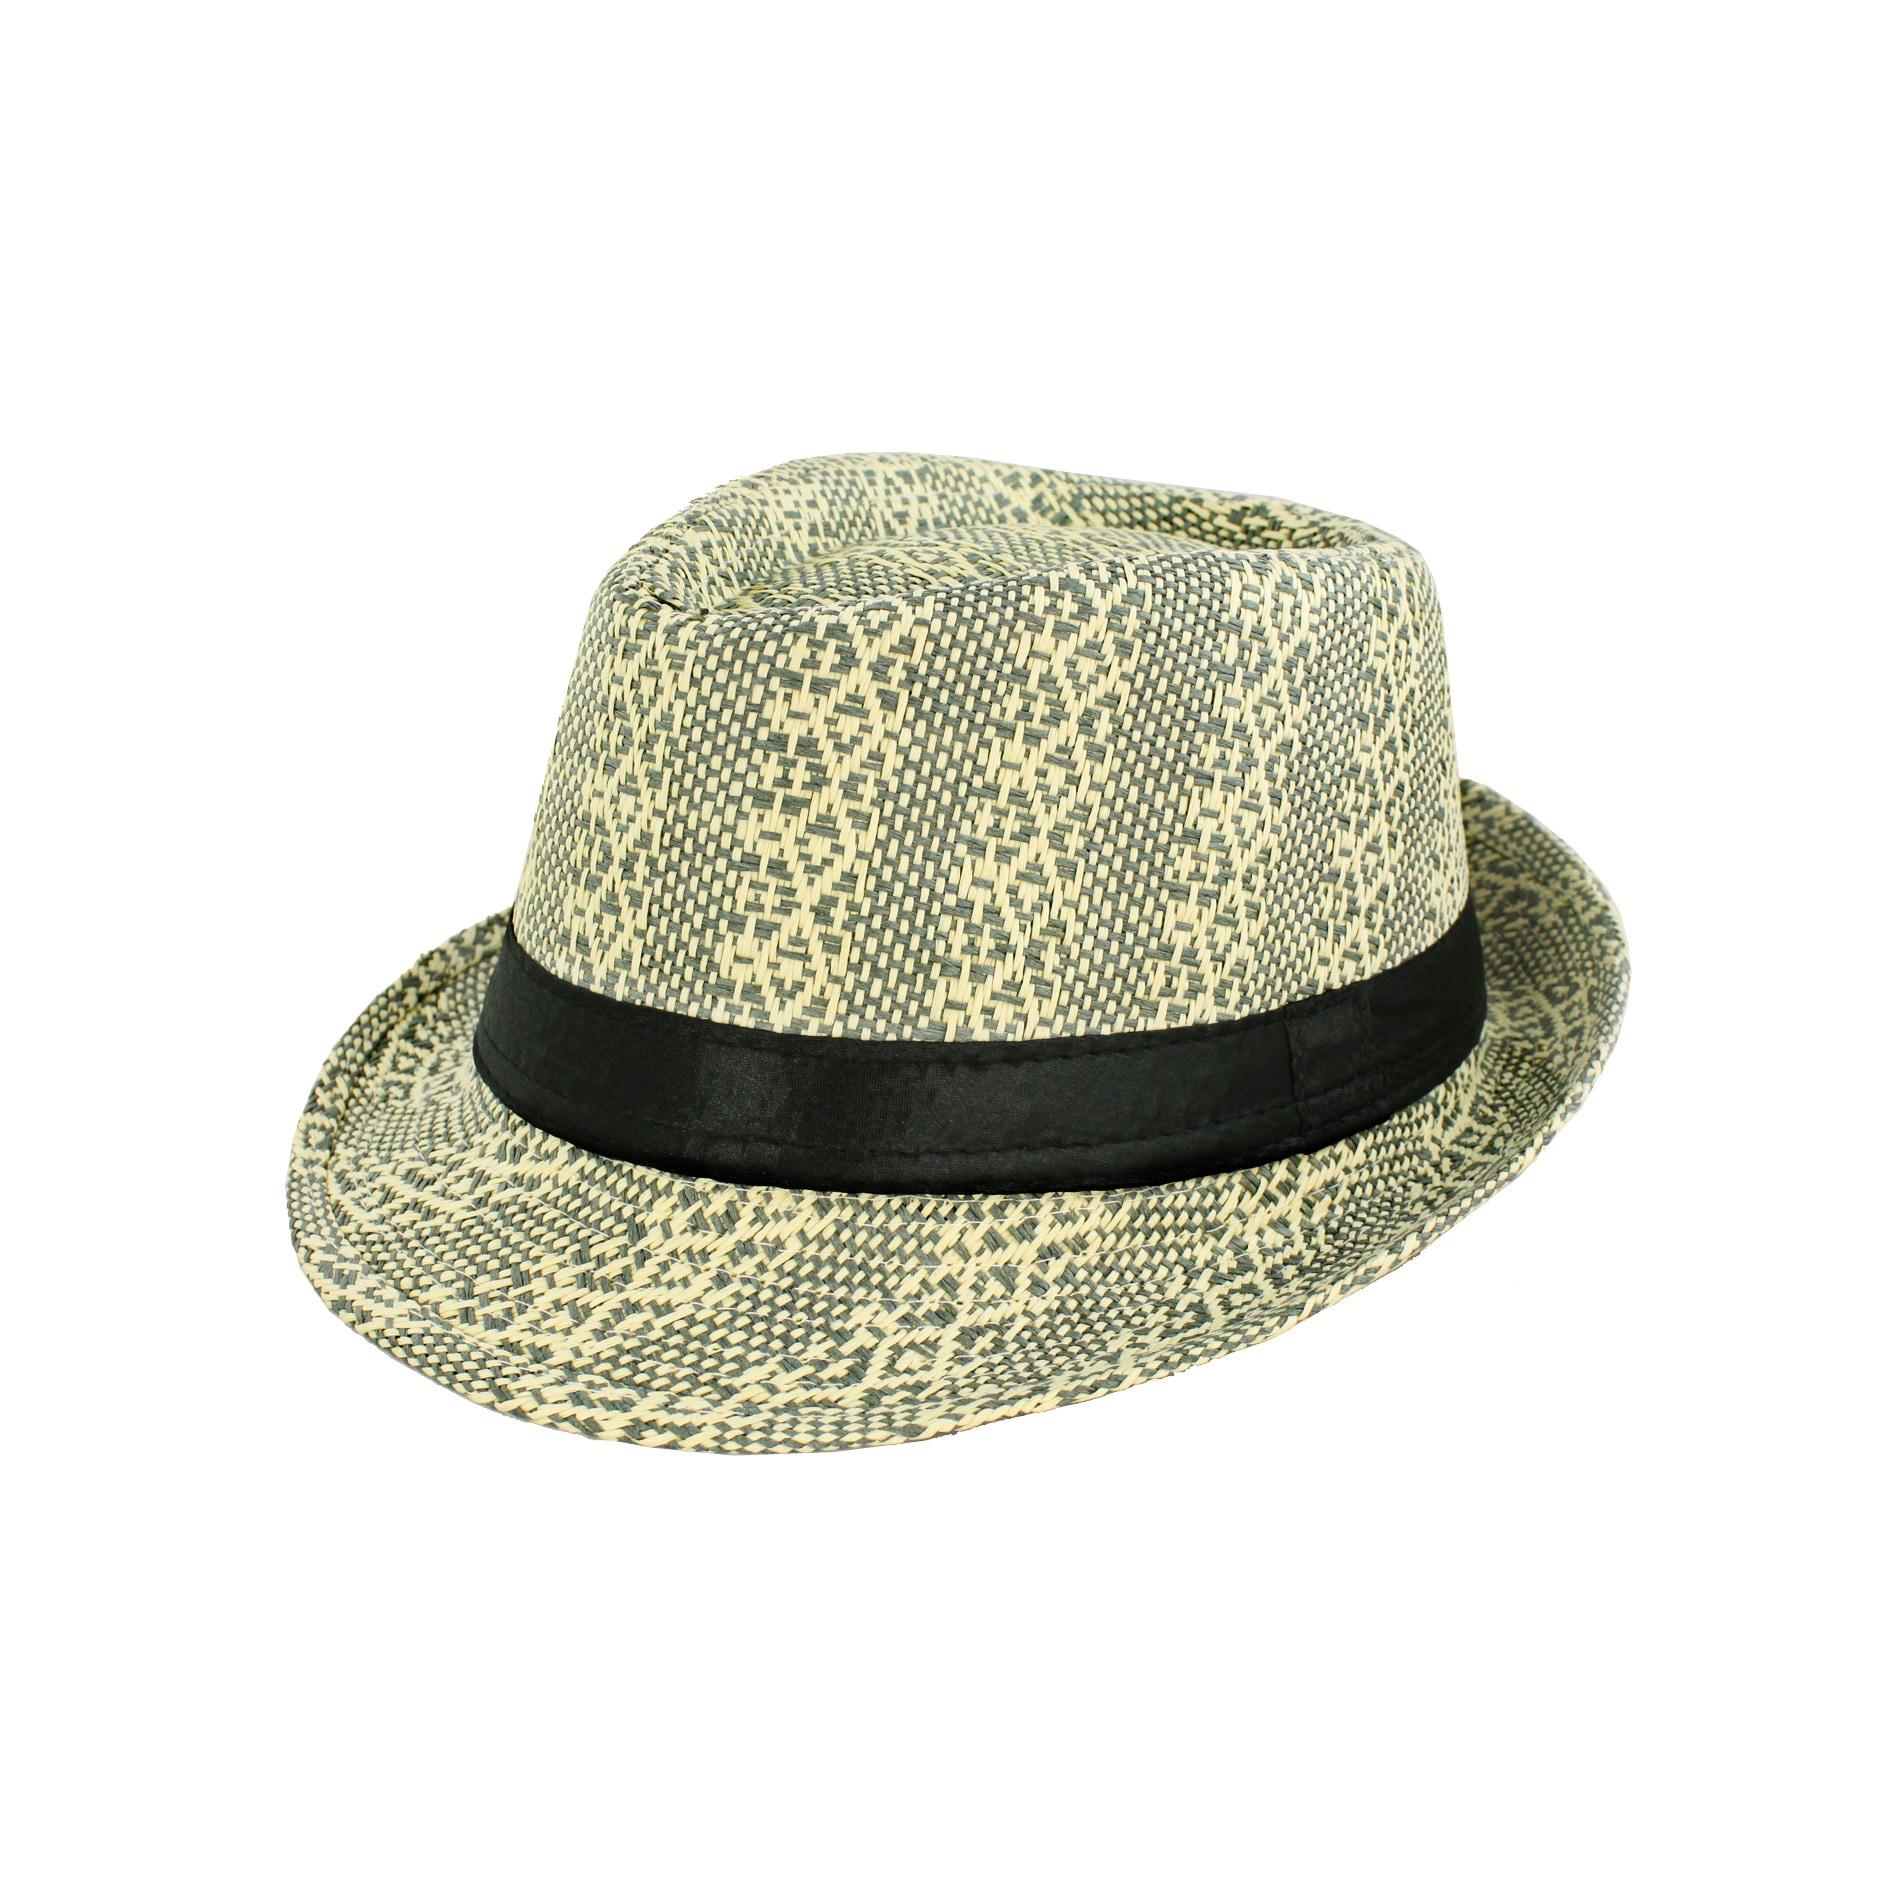 Faddism Men's Green/ Tan Woven Fedora Hat